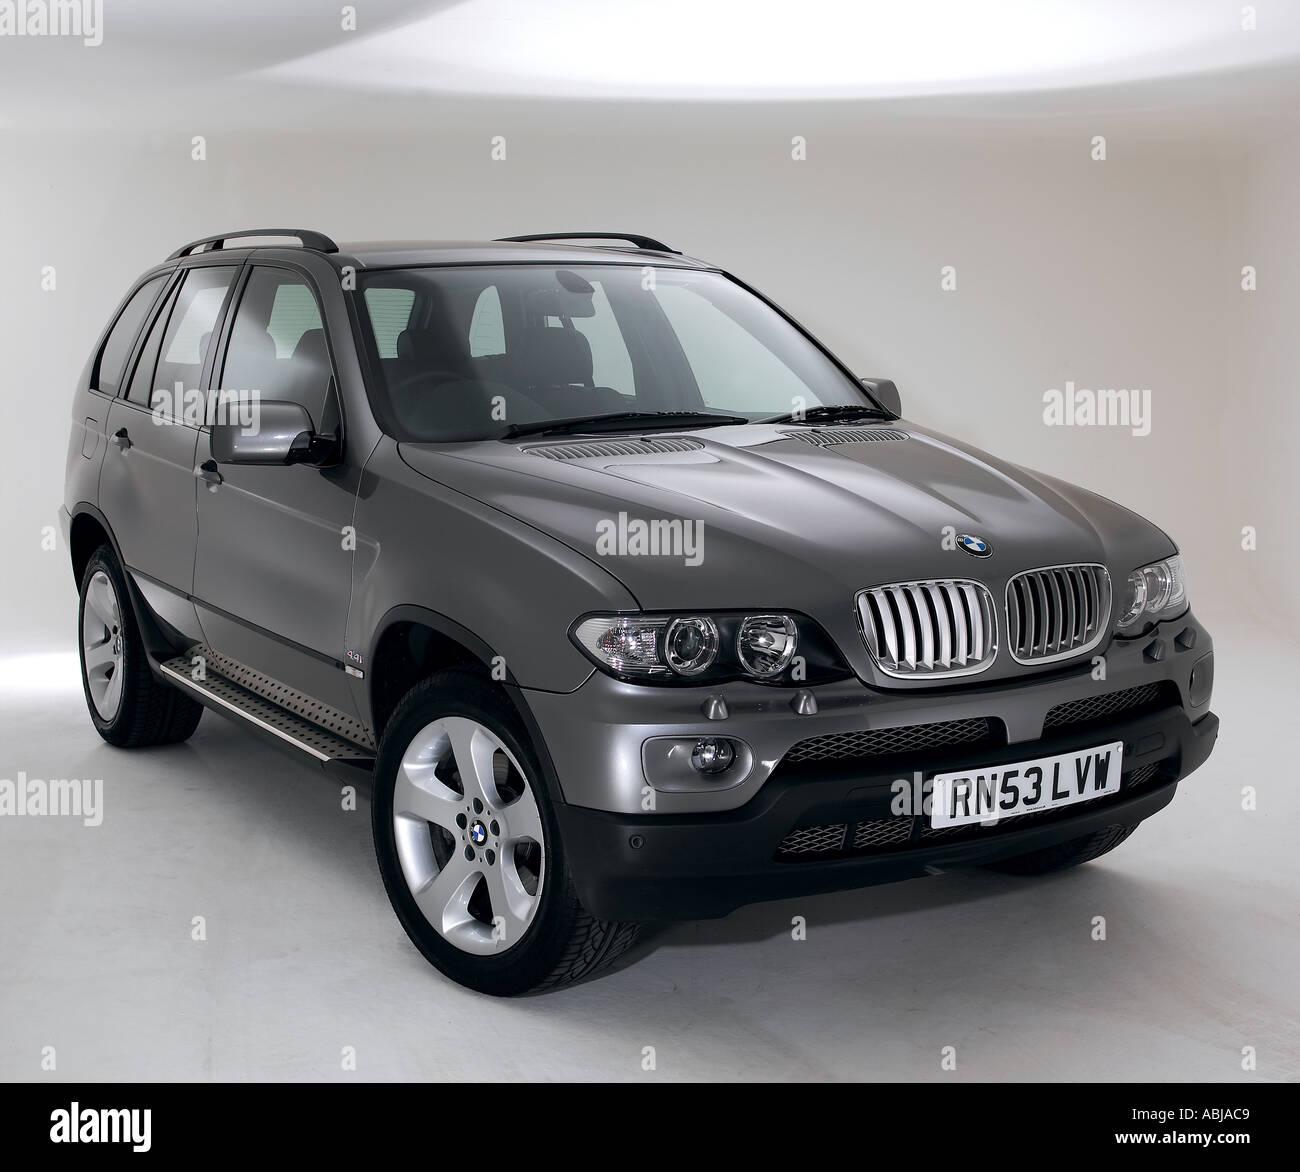 2003 BMW X5 - Stock Image